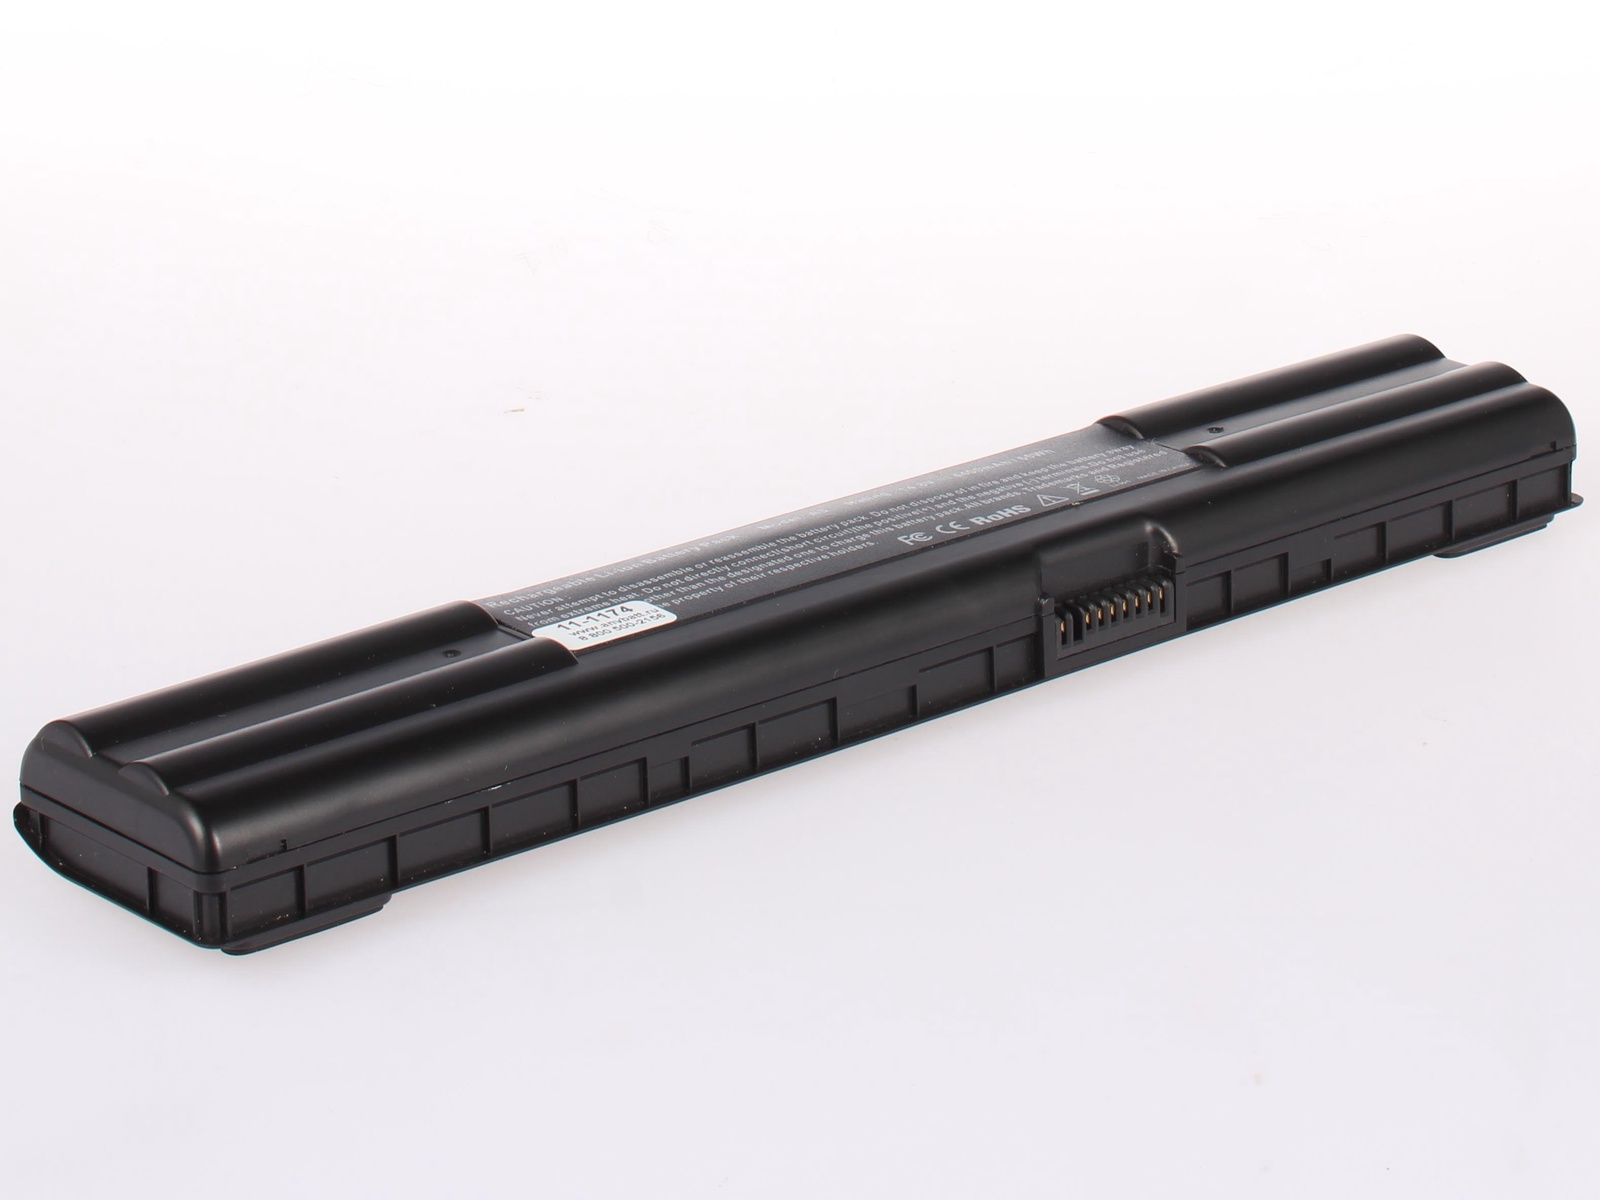 Аккумулятор для ноутбука AnyBatt Asus A42-A3, A42-A6, A41-A6, A41-A3, 70-NA51B1100, 90-NFPCB2001 аккумулятор zip 10 8v 4400mah 431902 для asus a40 a40j a42 a62 a50 a52a a52jb